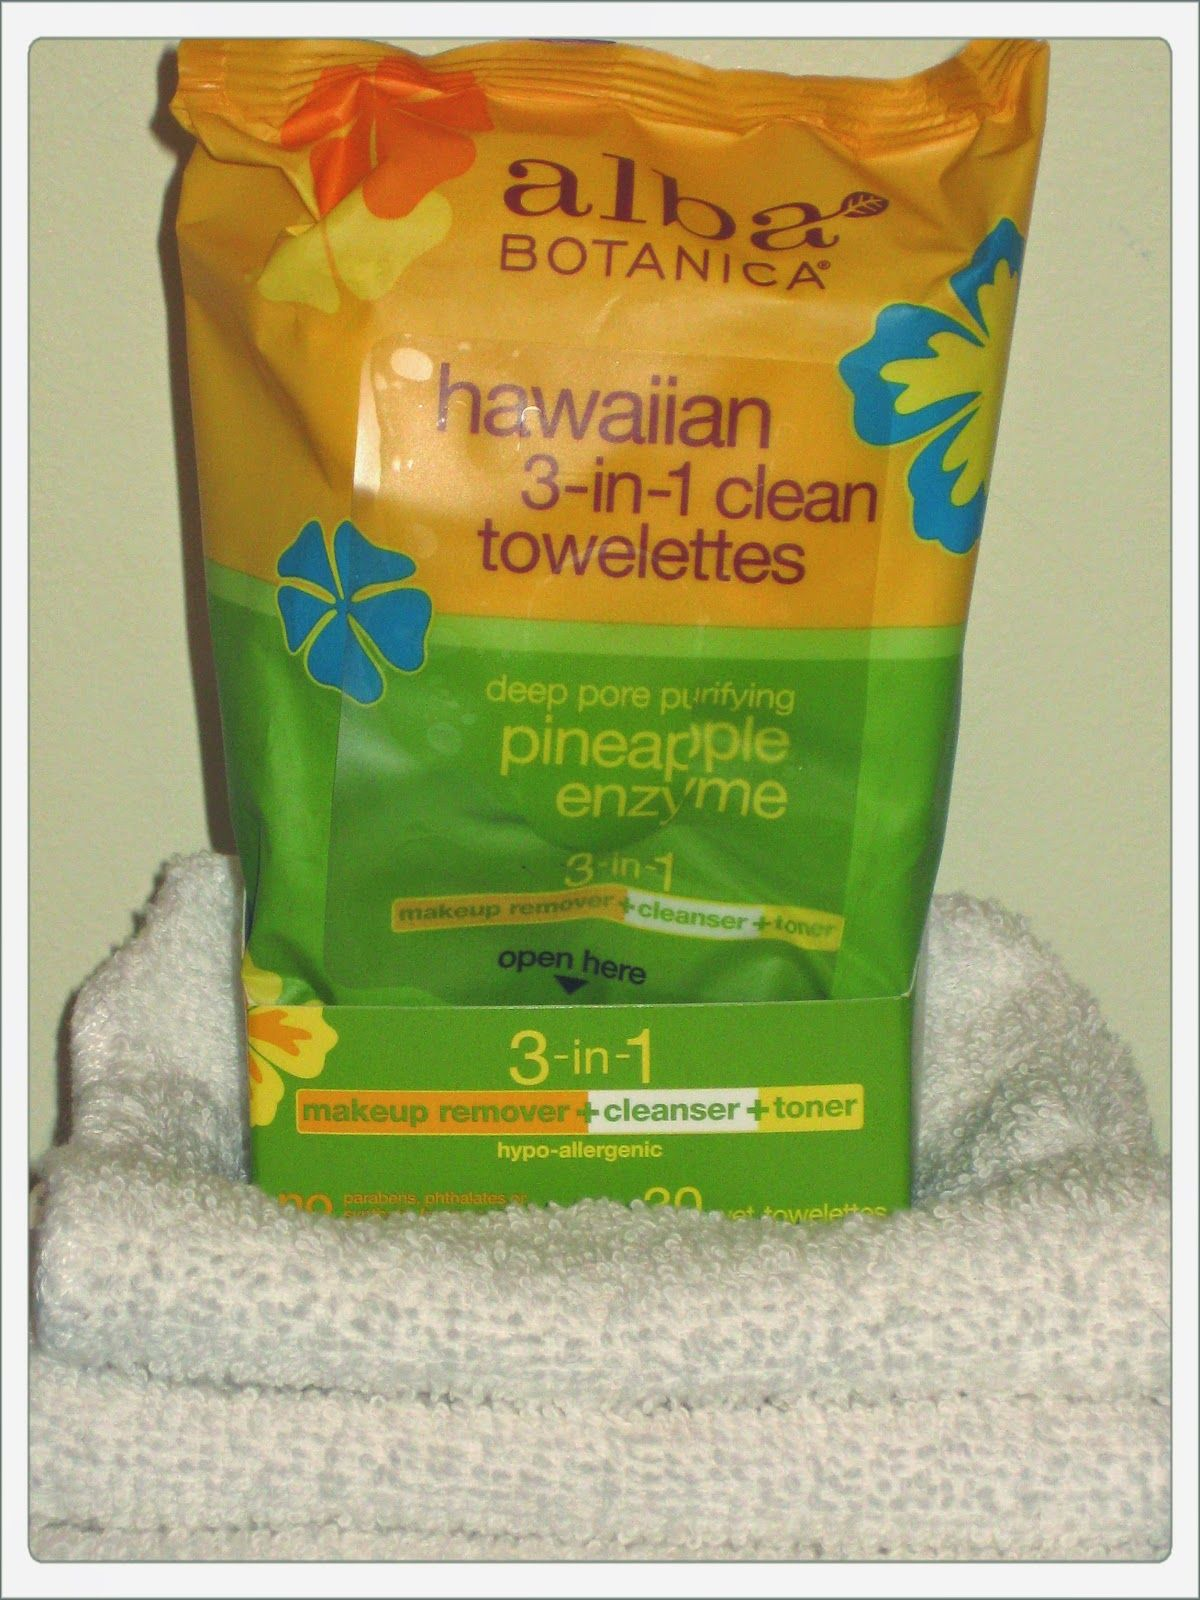 ALBA BOTANICA HAWAIIAN Makeup Remover Towelettes Cruelty